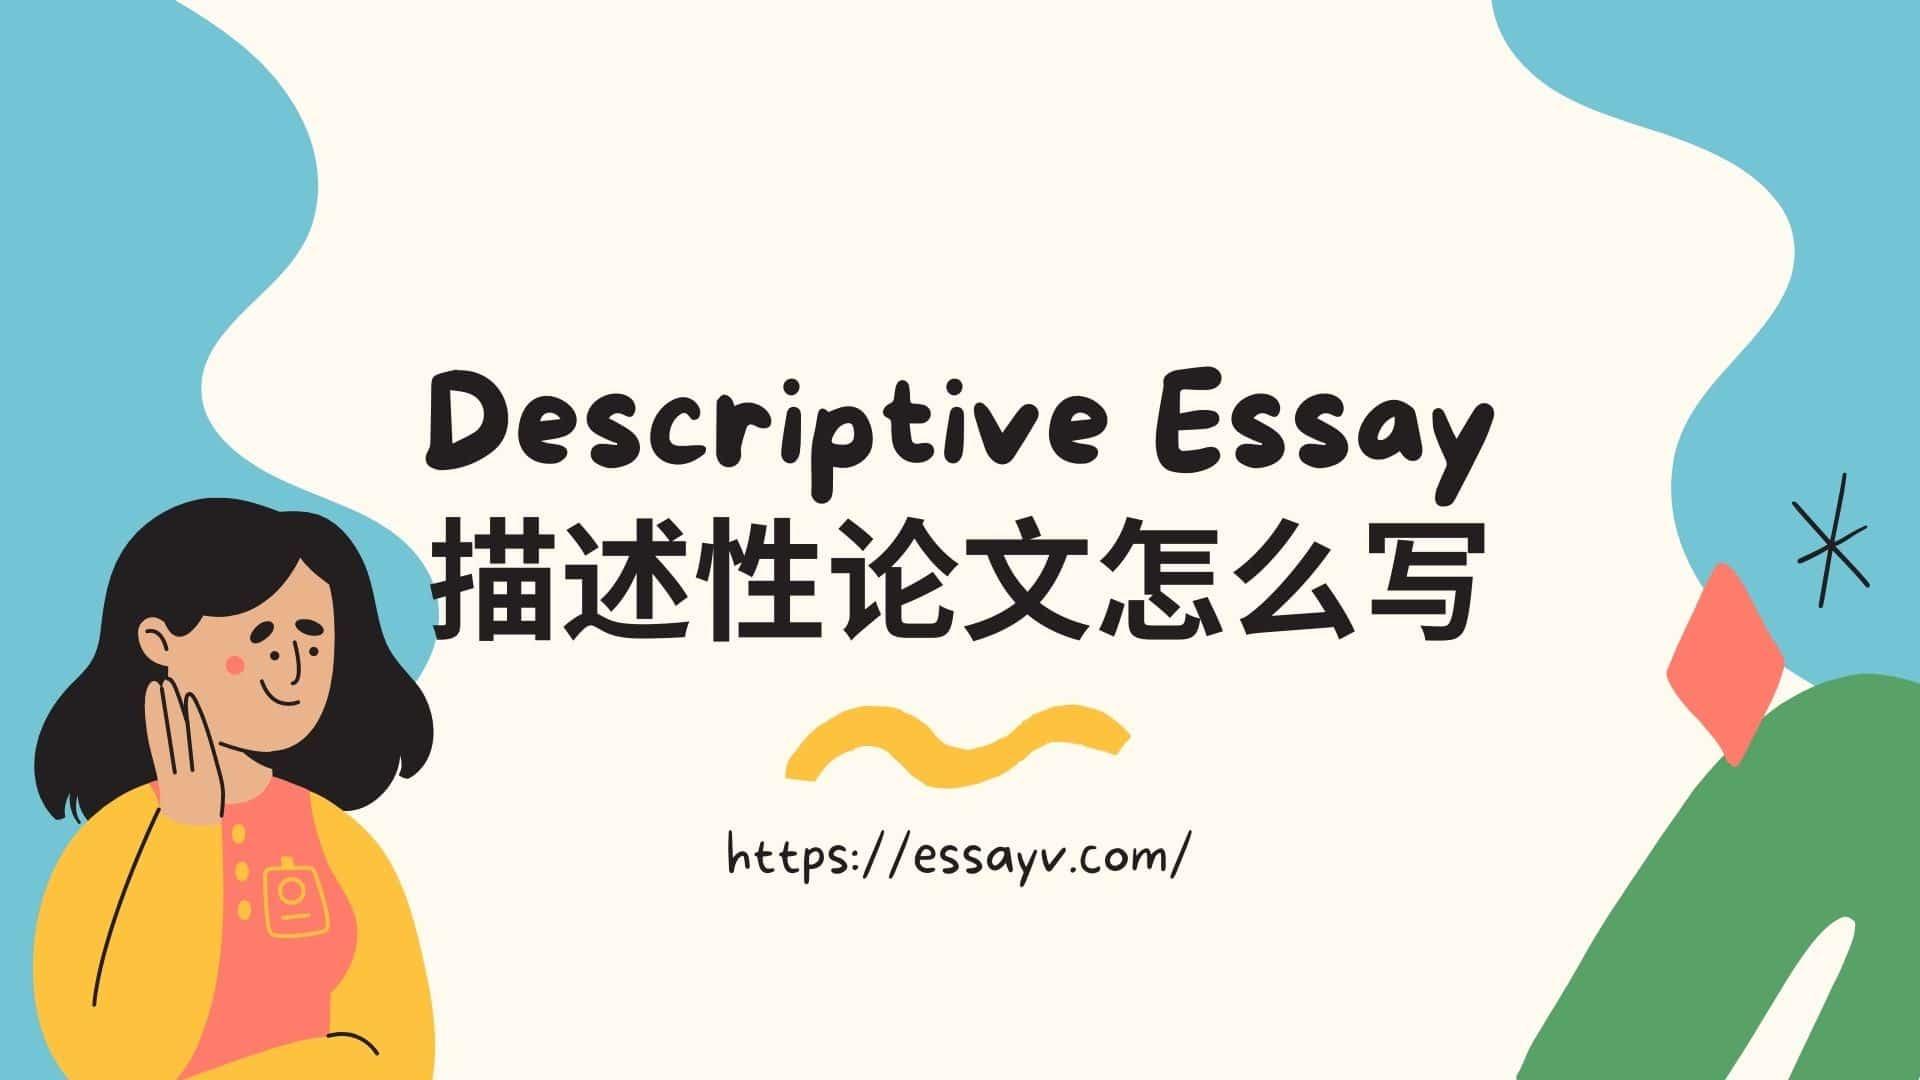 Descriptive Essay描述性论文怎么写